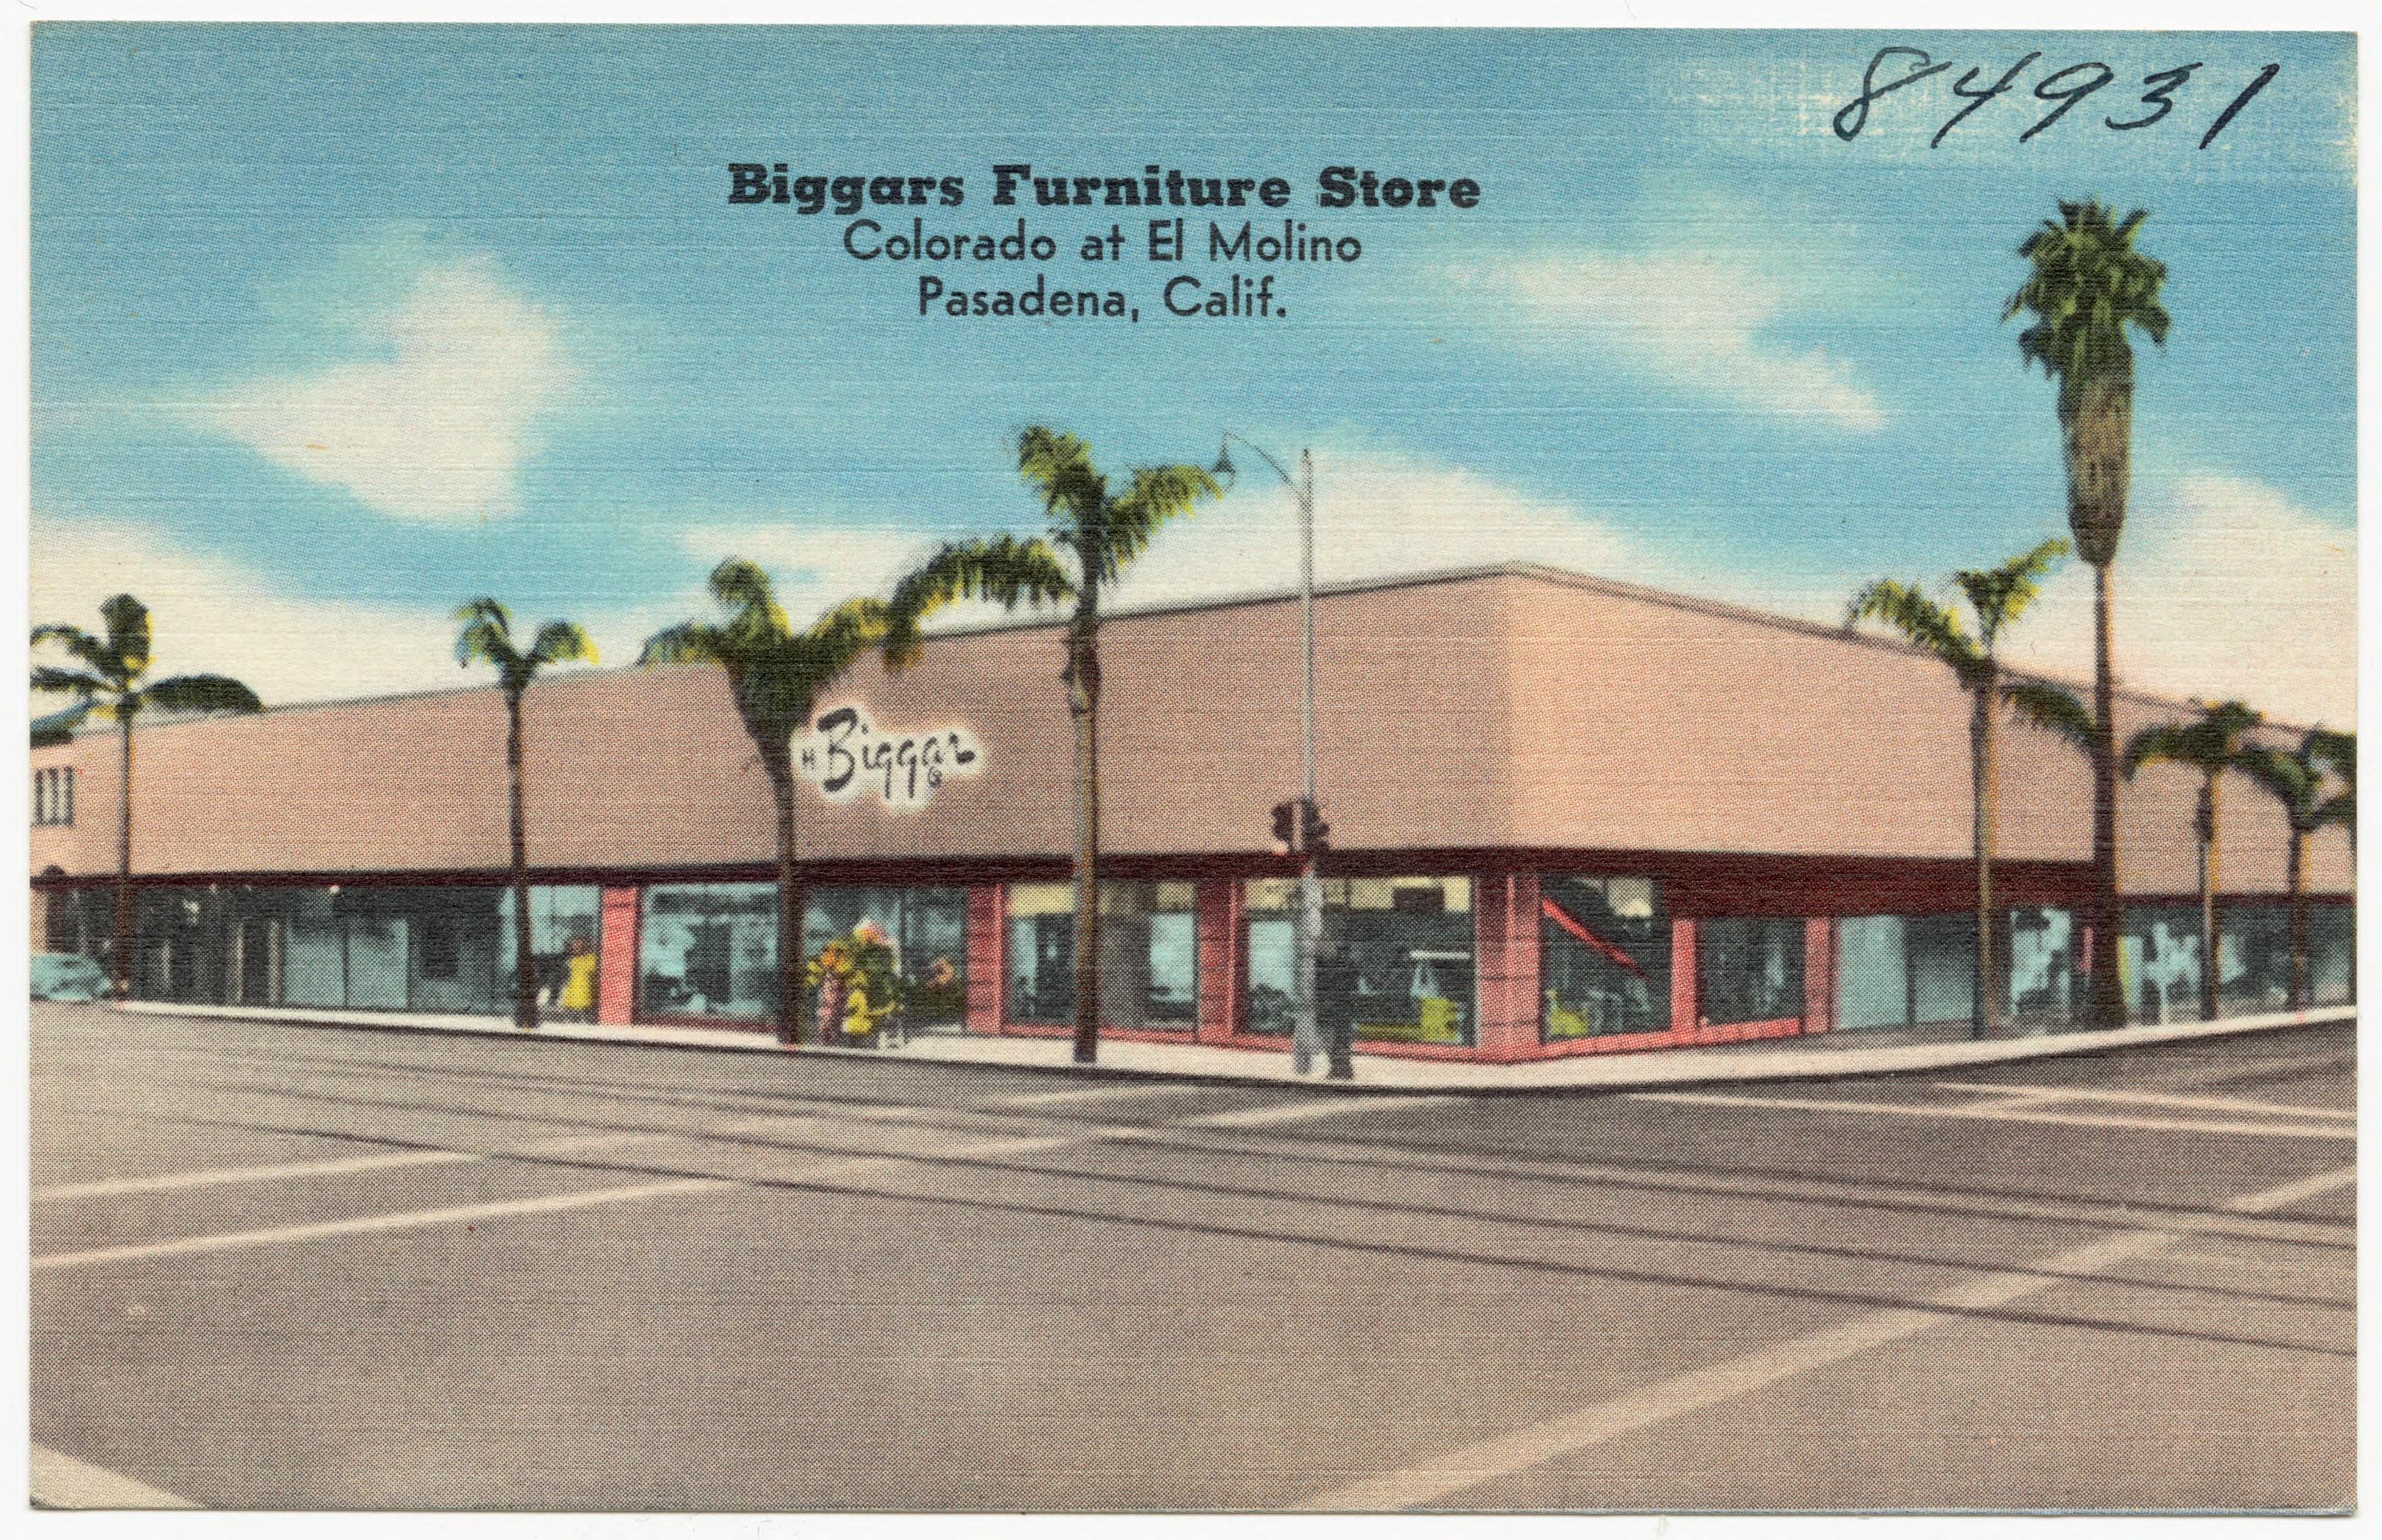 File Biggars Furniture Store Colorado At El Molino Pasadena Calif 84931 Jpg Wikimedia Commons